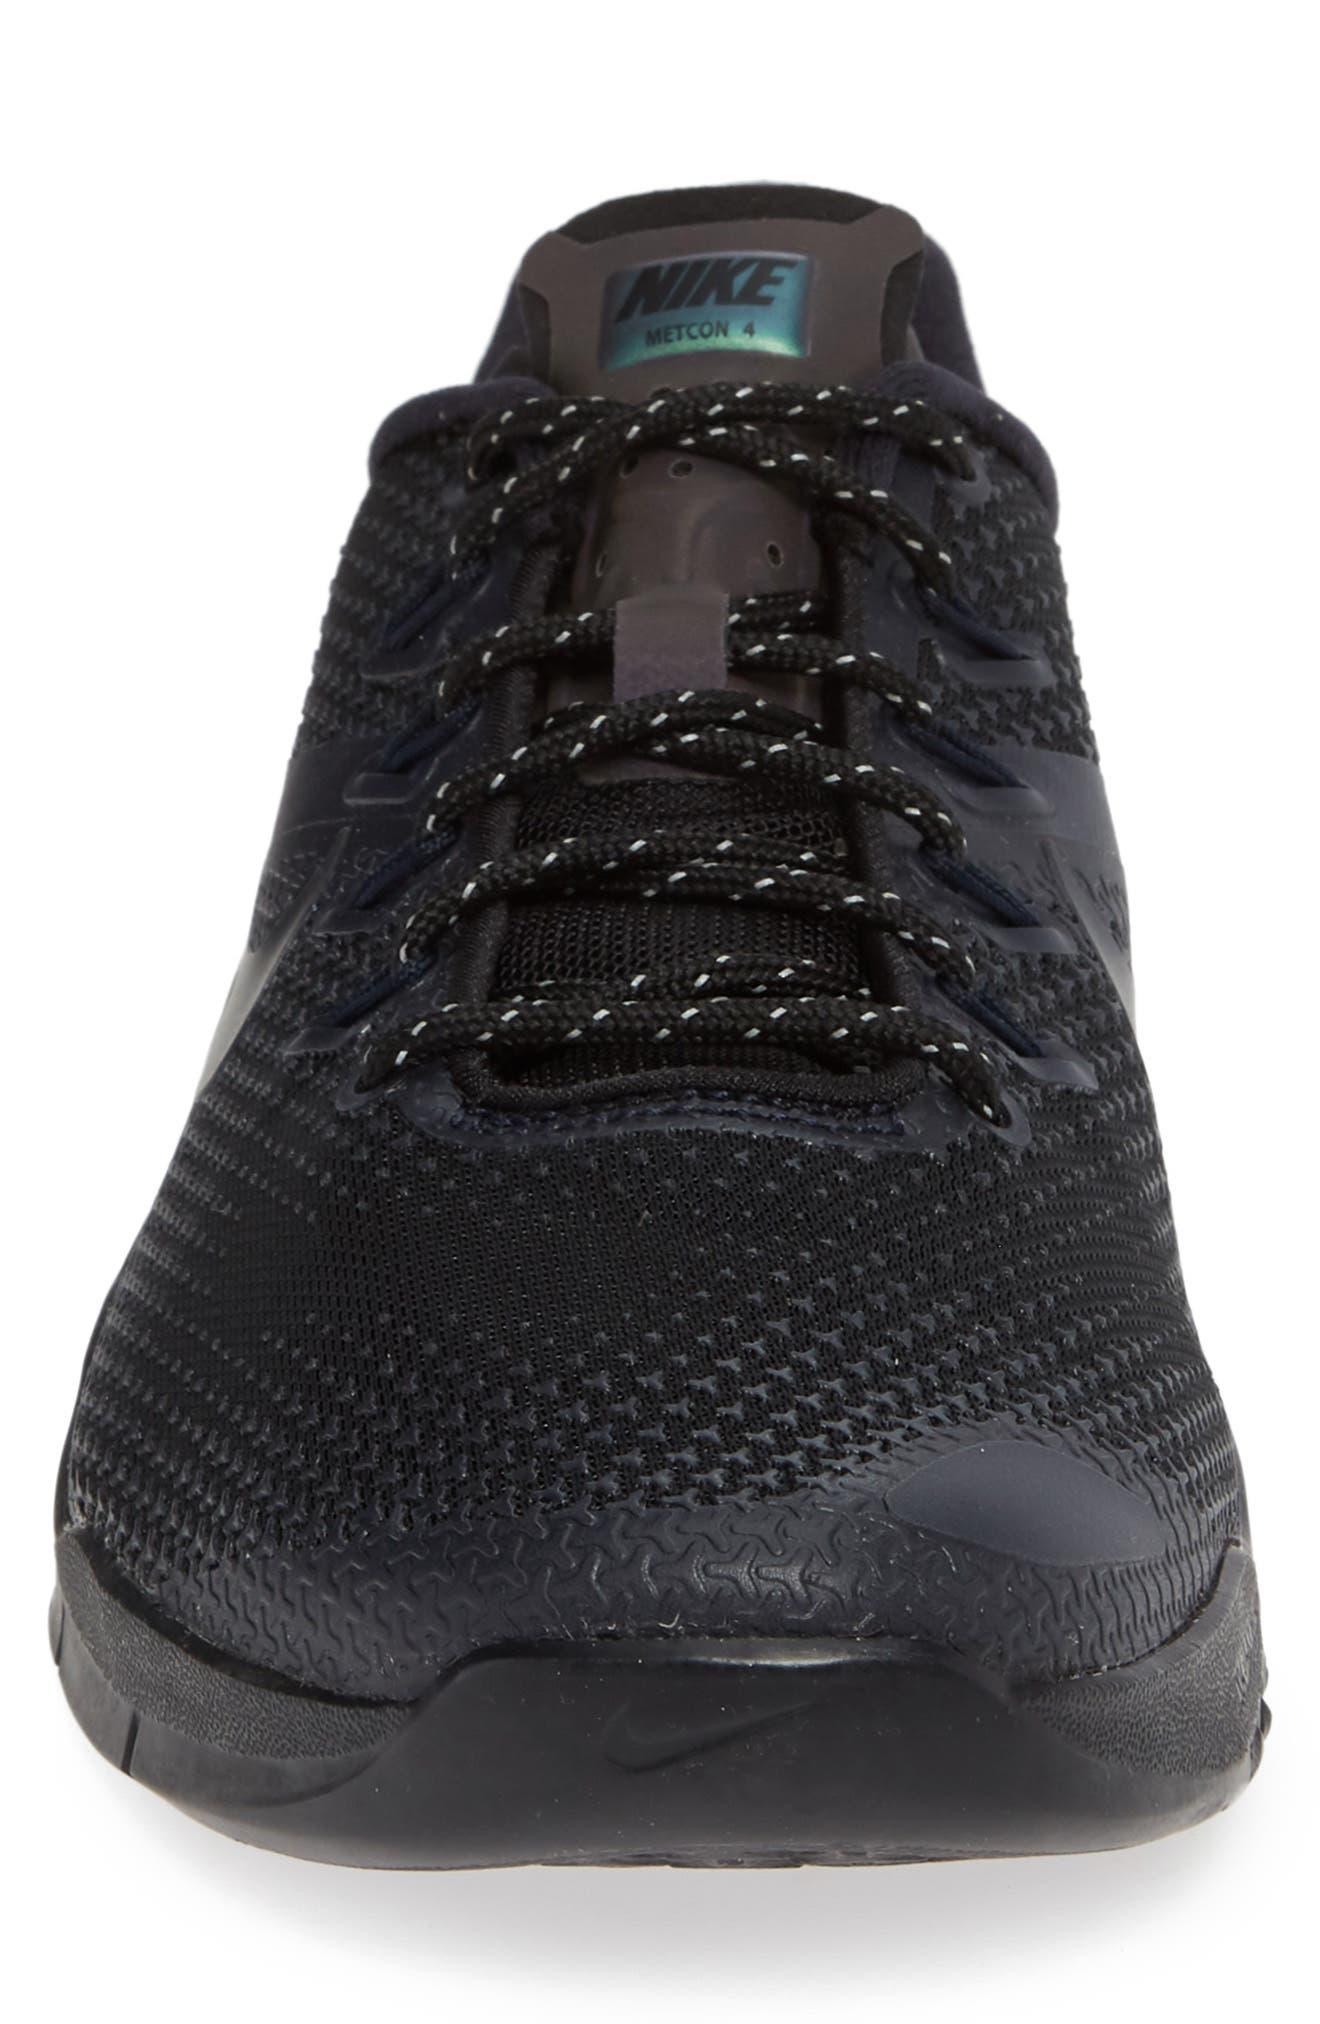 NIKE,                             Metcon 4 Prem Training Shoe,                             Alternate thumbnail 4, color,                             BLACK/ BLACK/ DARK OBSIDIAN